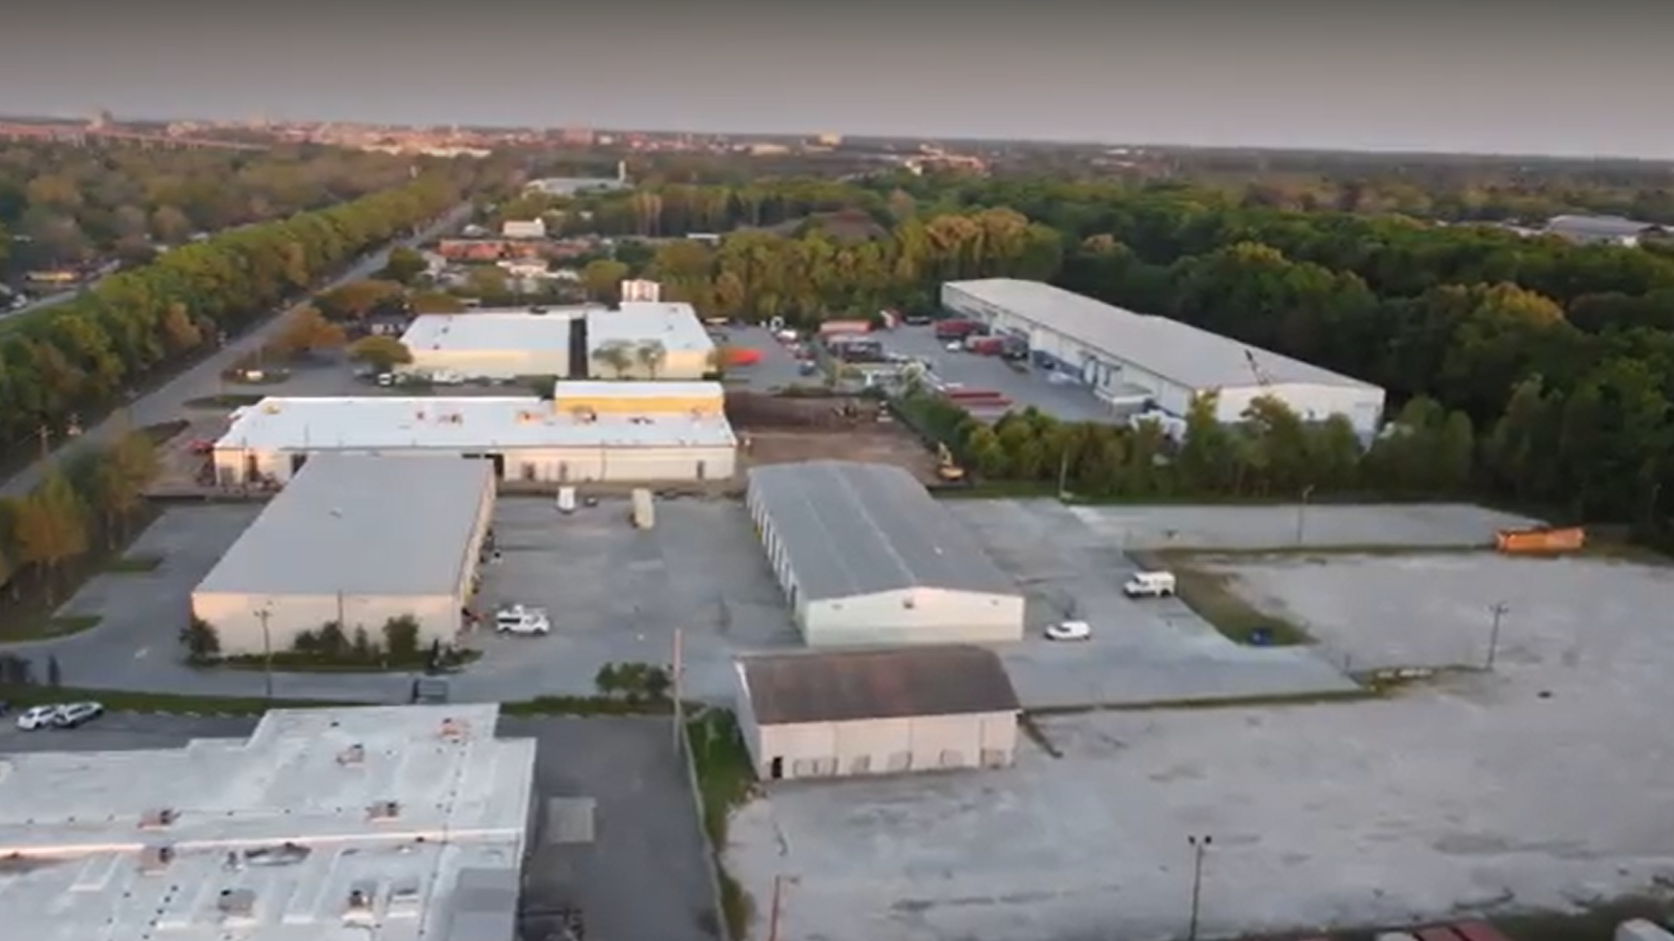 Drone: Expansion at SCAD film studios in Savannah